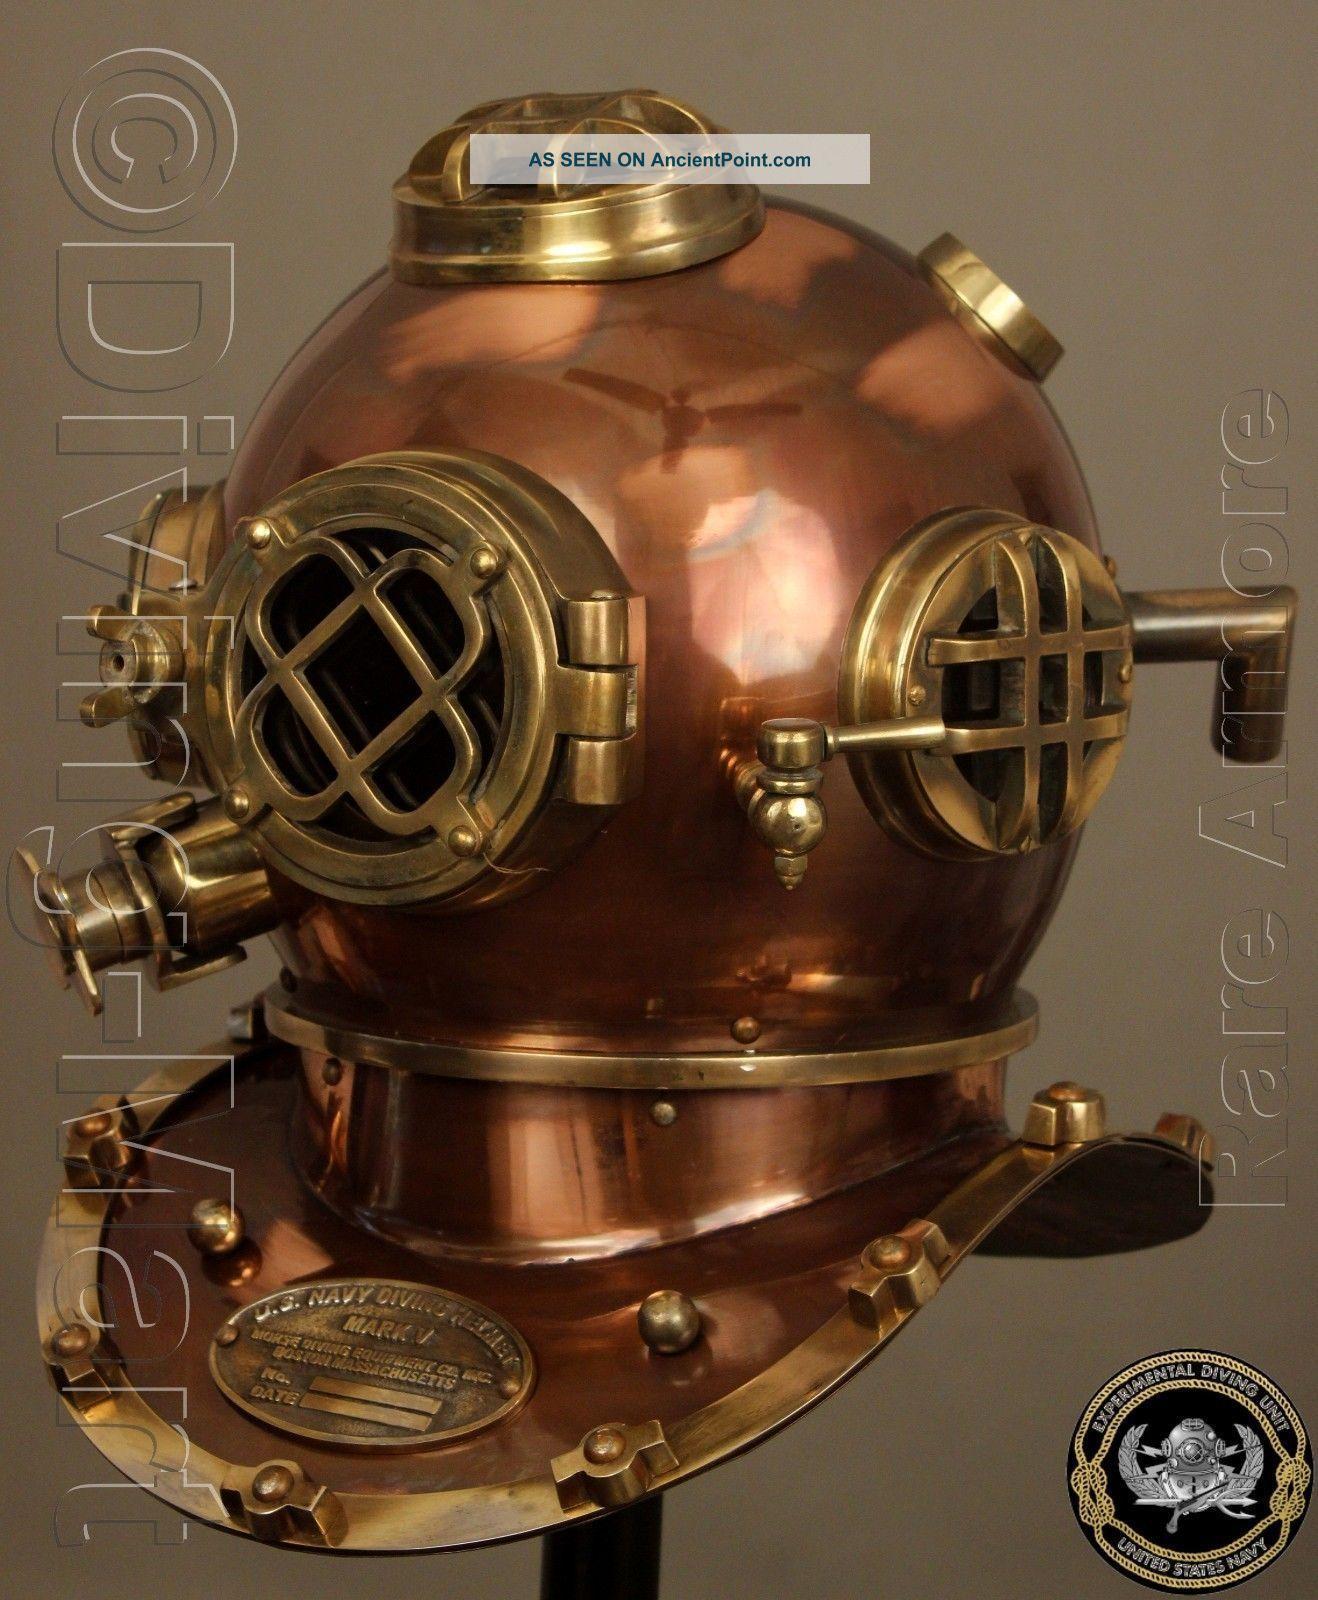 Antique Diving Divers Helmet Solid Steel Brass U.  S Navy Mark V Full Size 18 Inch Diving Helmets photo